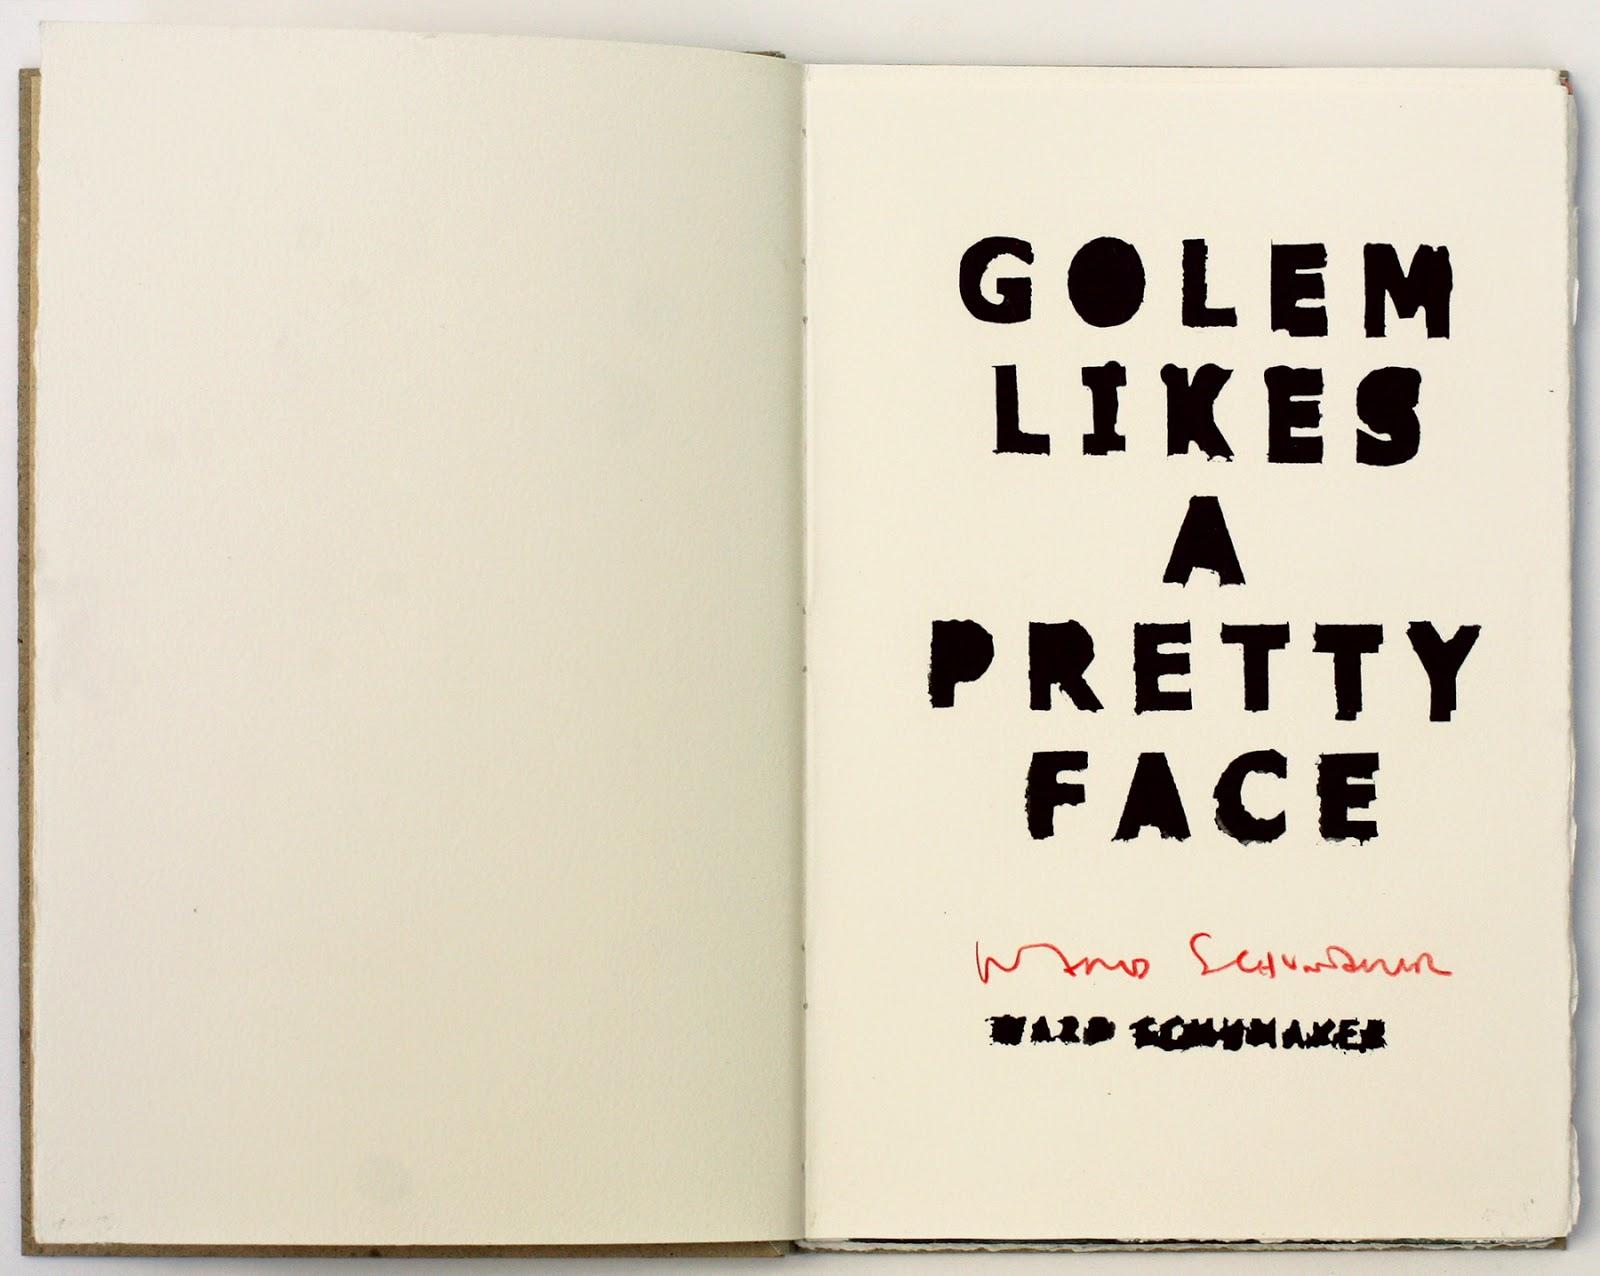 Golem Likes a Pretty Face, book, 2014